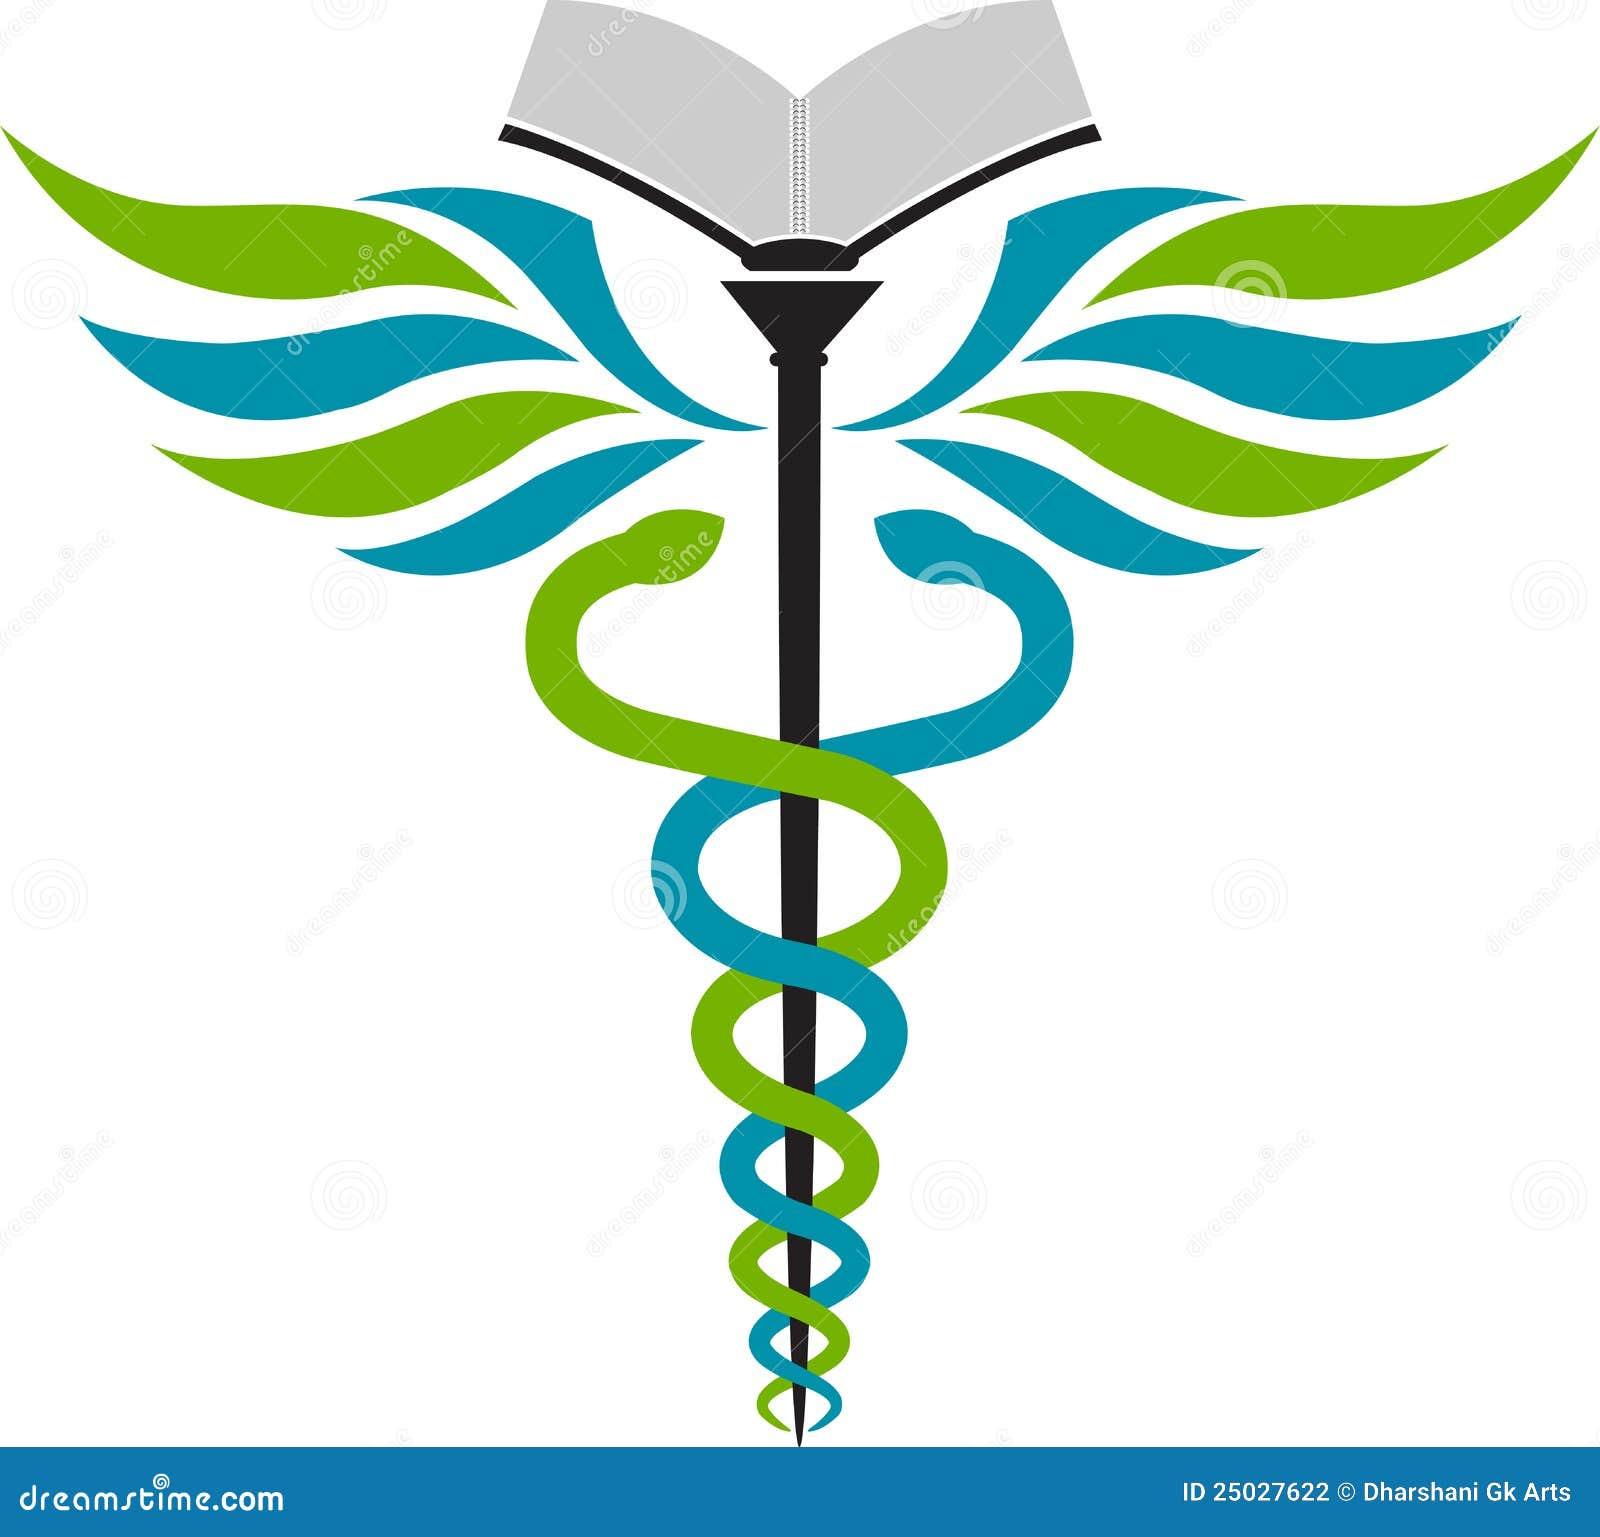 hospital education logo stock photography image 25027622 caduceus medical symbol vector free Cadeus Medical